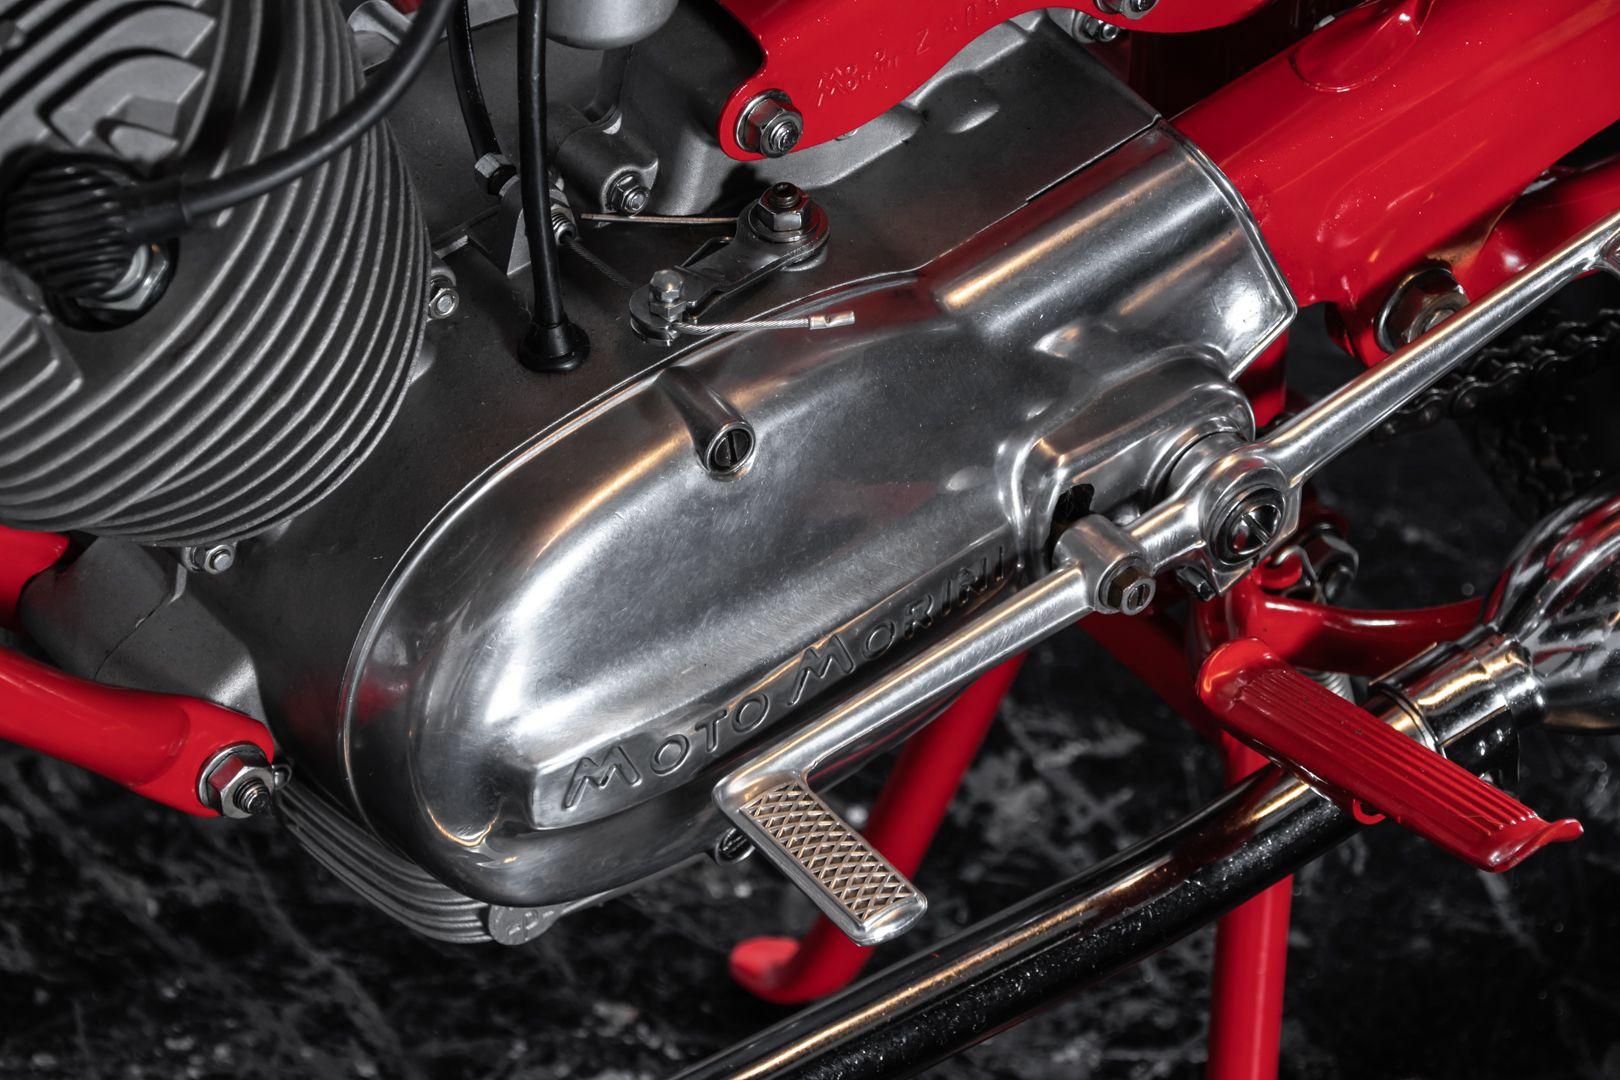 1966 Moto Morini Corsarino Z 60cc 76732